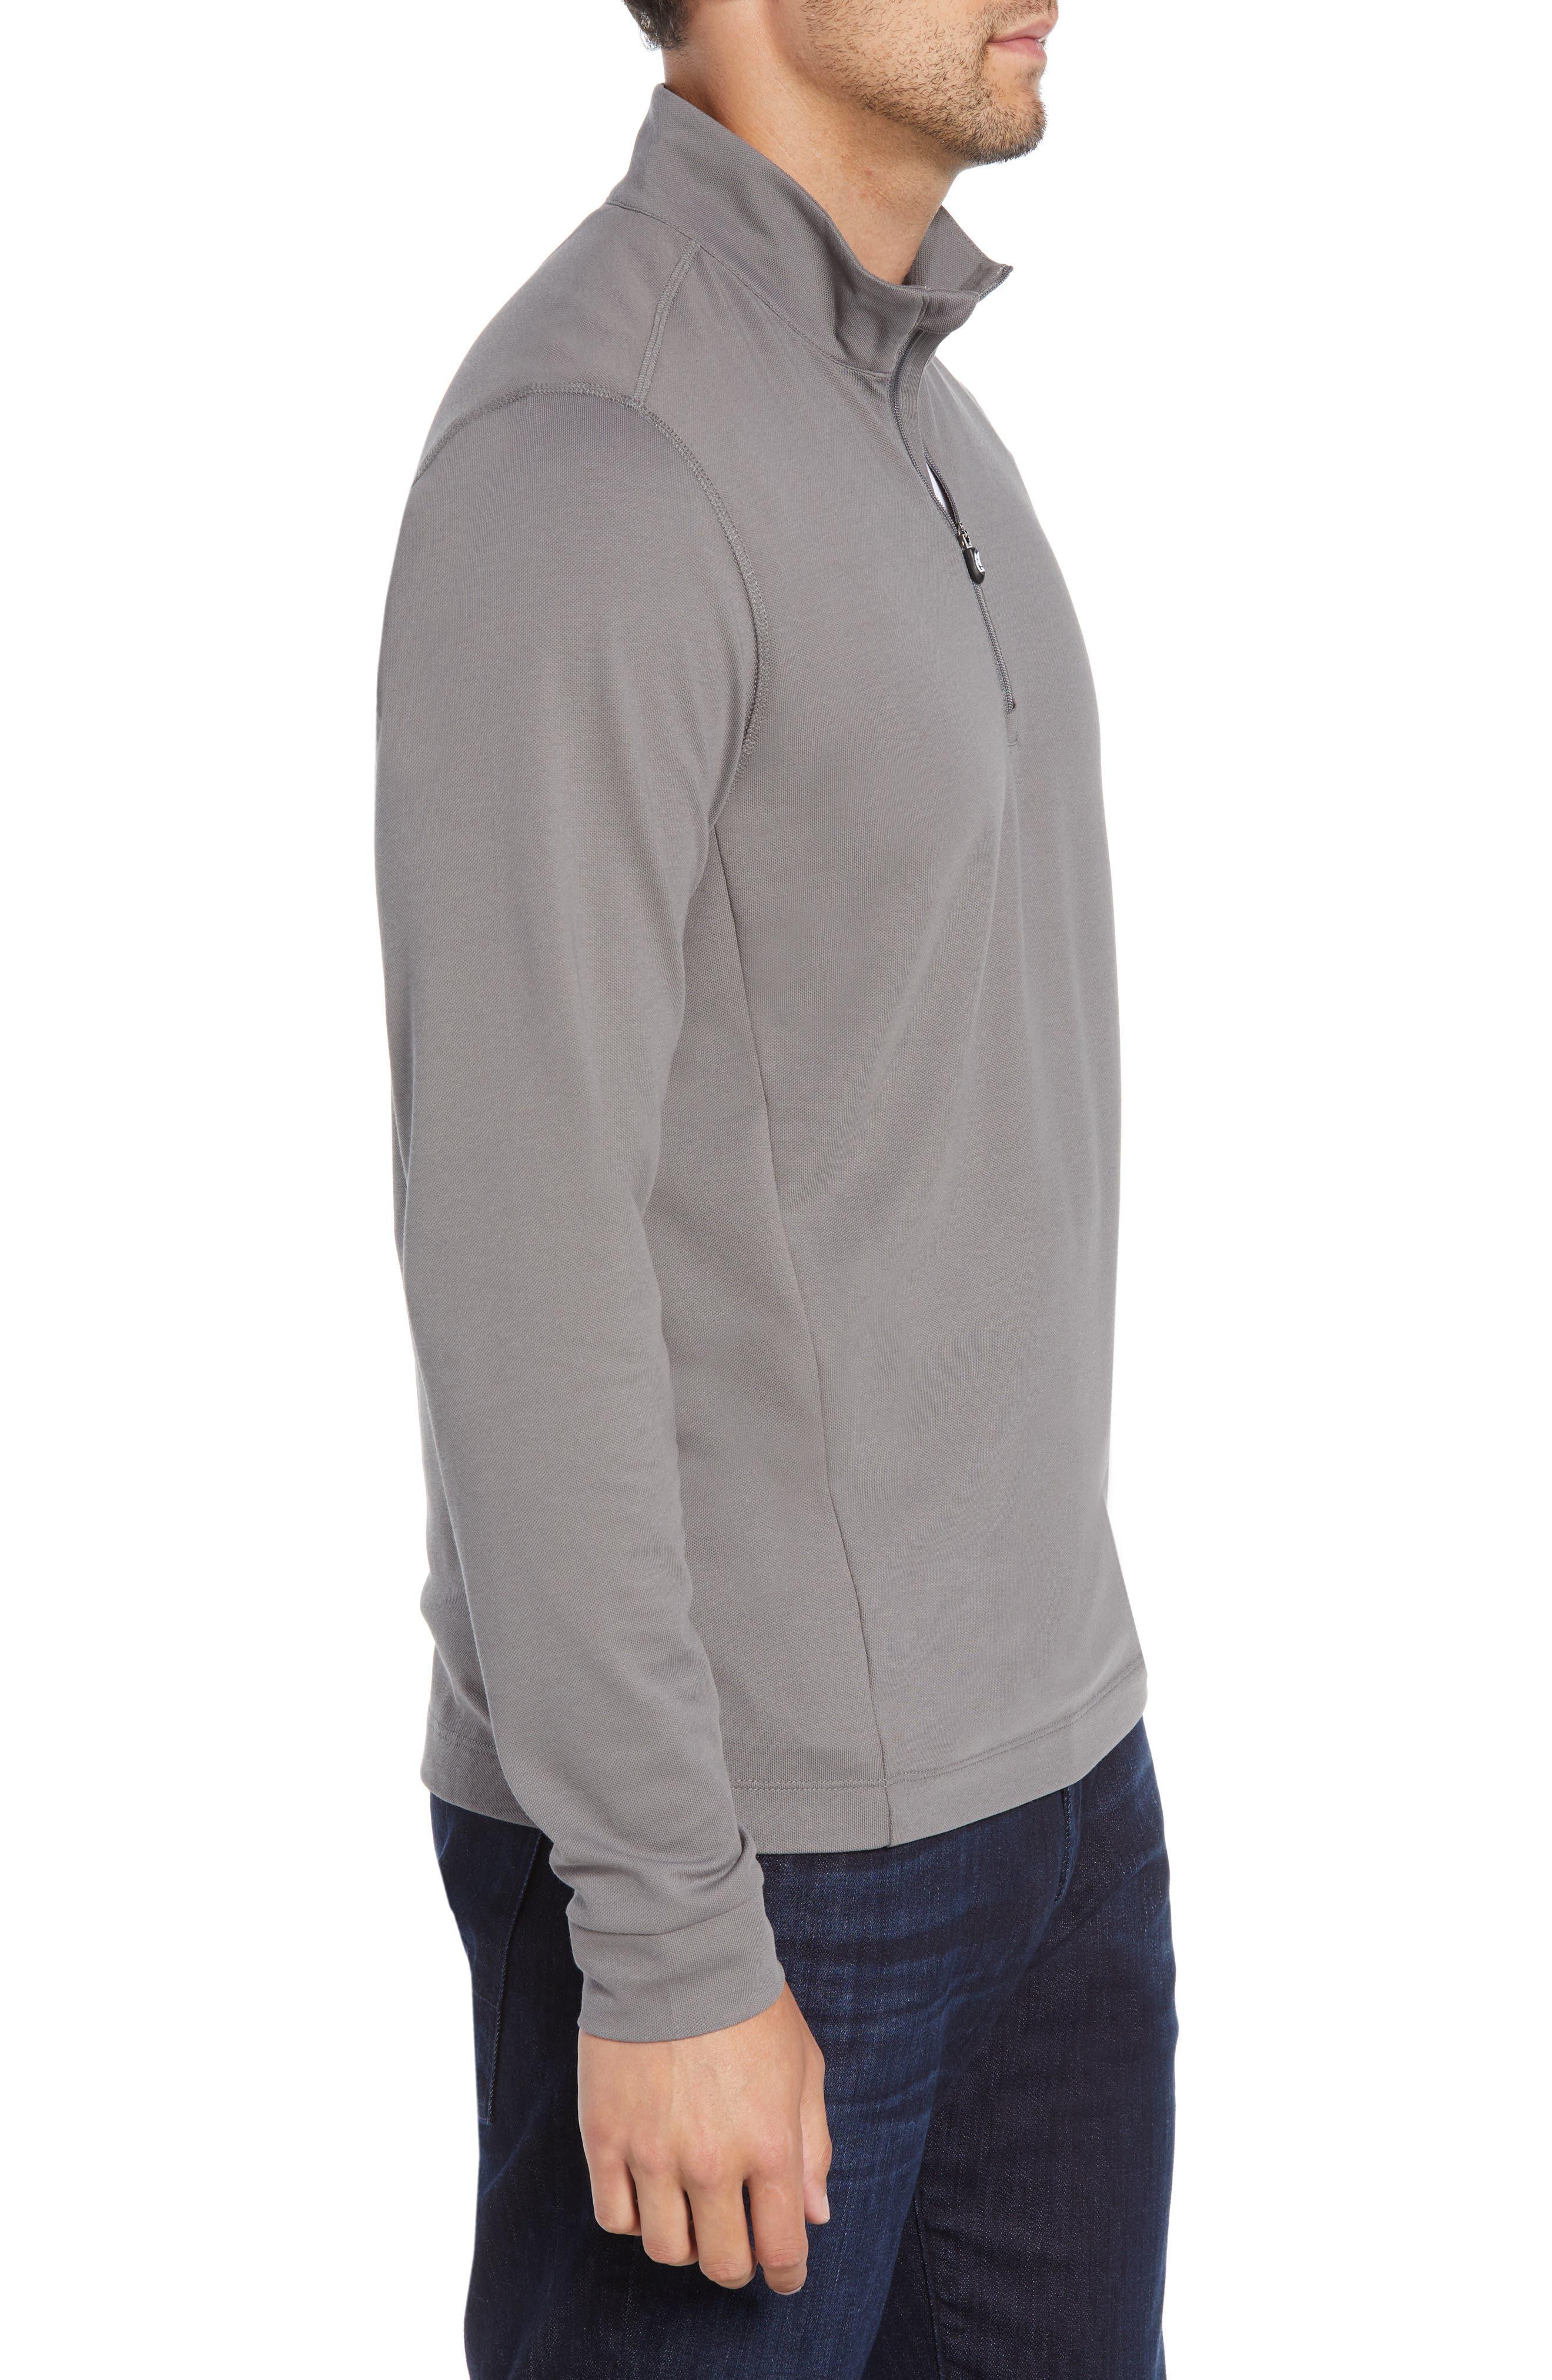 CUTTER & BUCK, Advantage Regular Fit DryTec Mock Neck Pullover, Alternate thumbnail 3, color, ELEMENTAL GREY